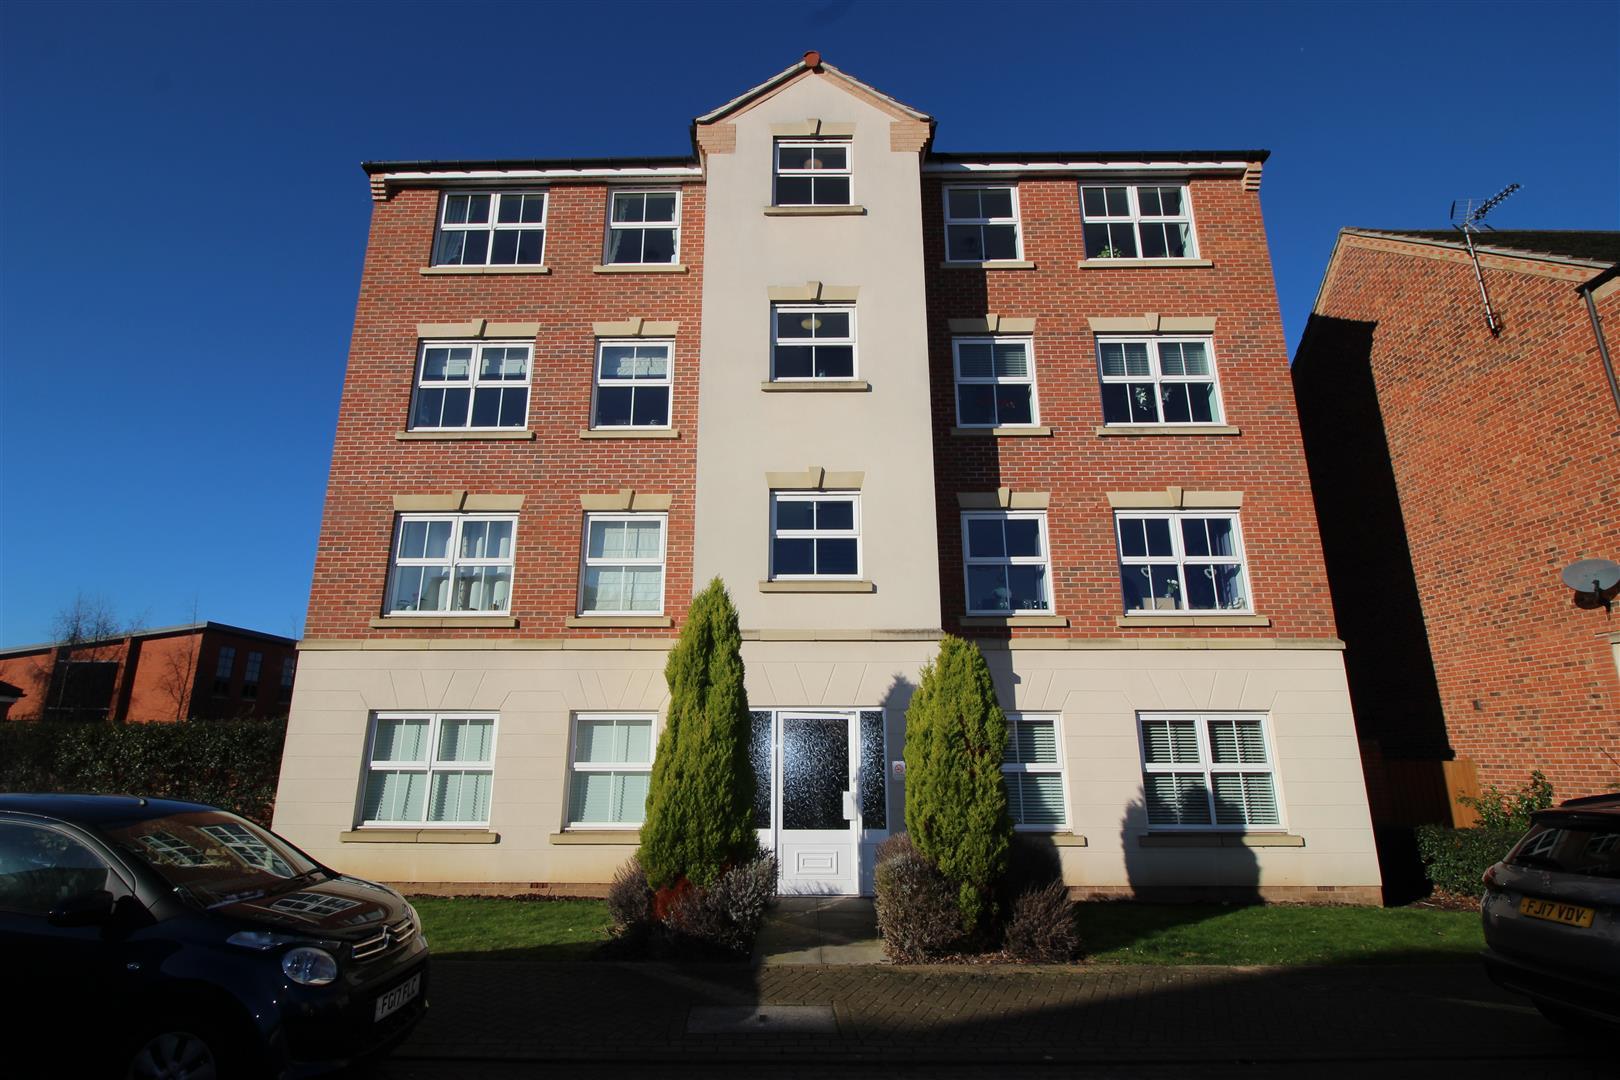 2 Bedrooms Flat for sale in Mountbatten Way, Chilwell